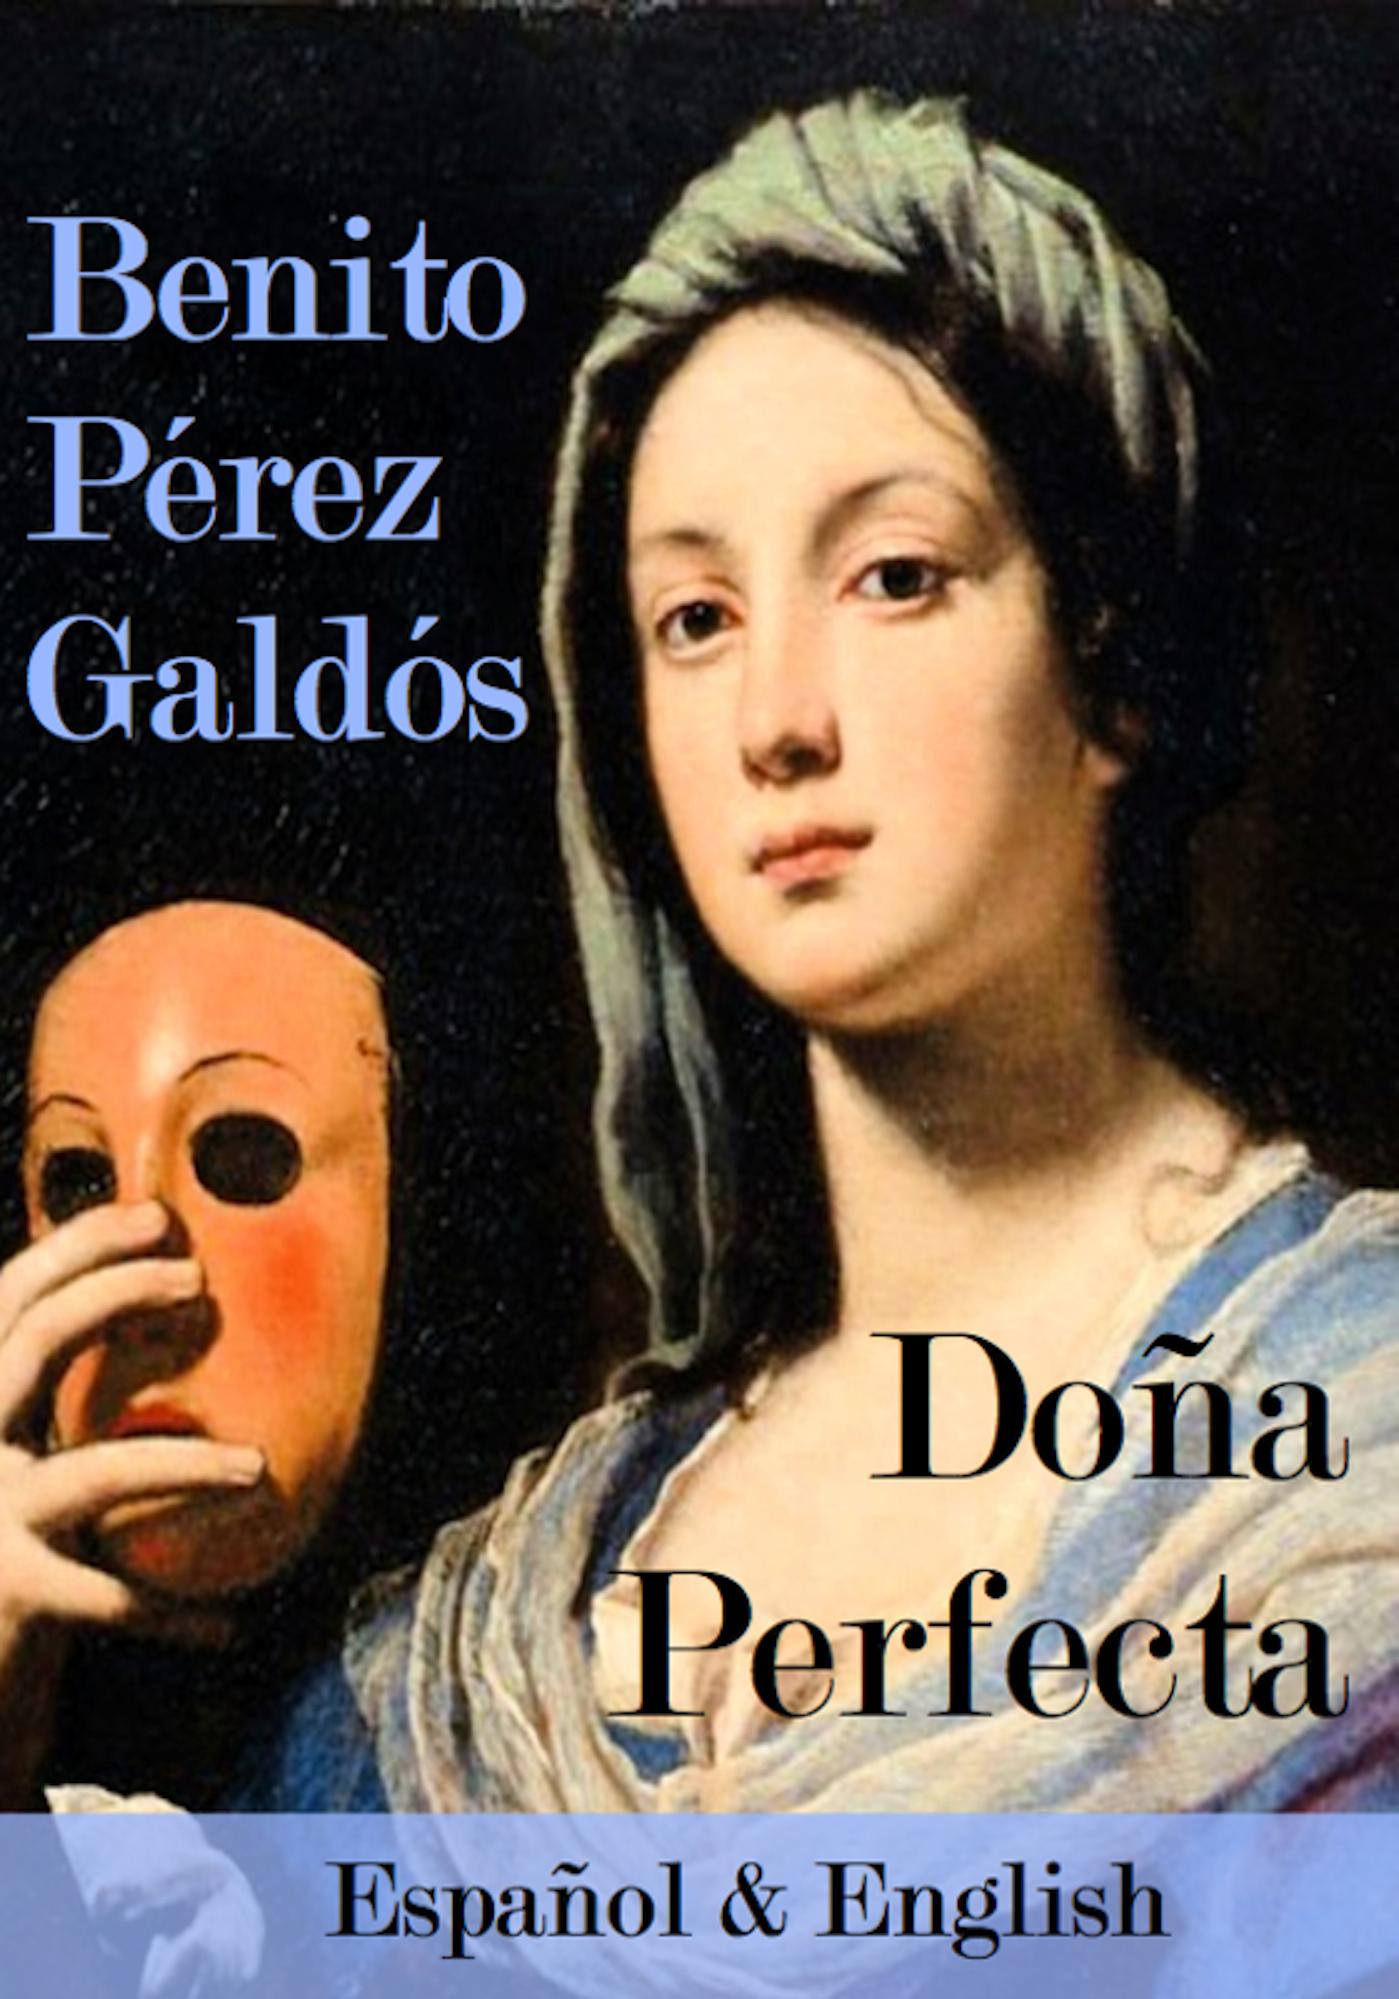 RESUMEN DOÑA PERFECTA - Benito Perez Galdos